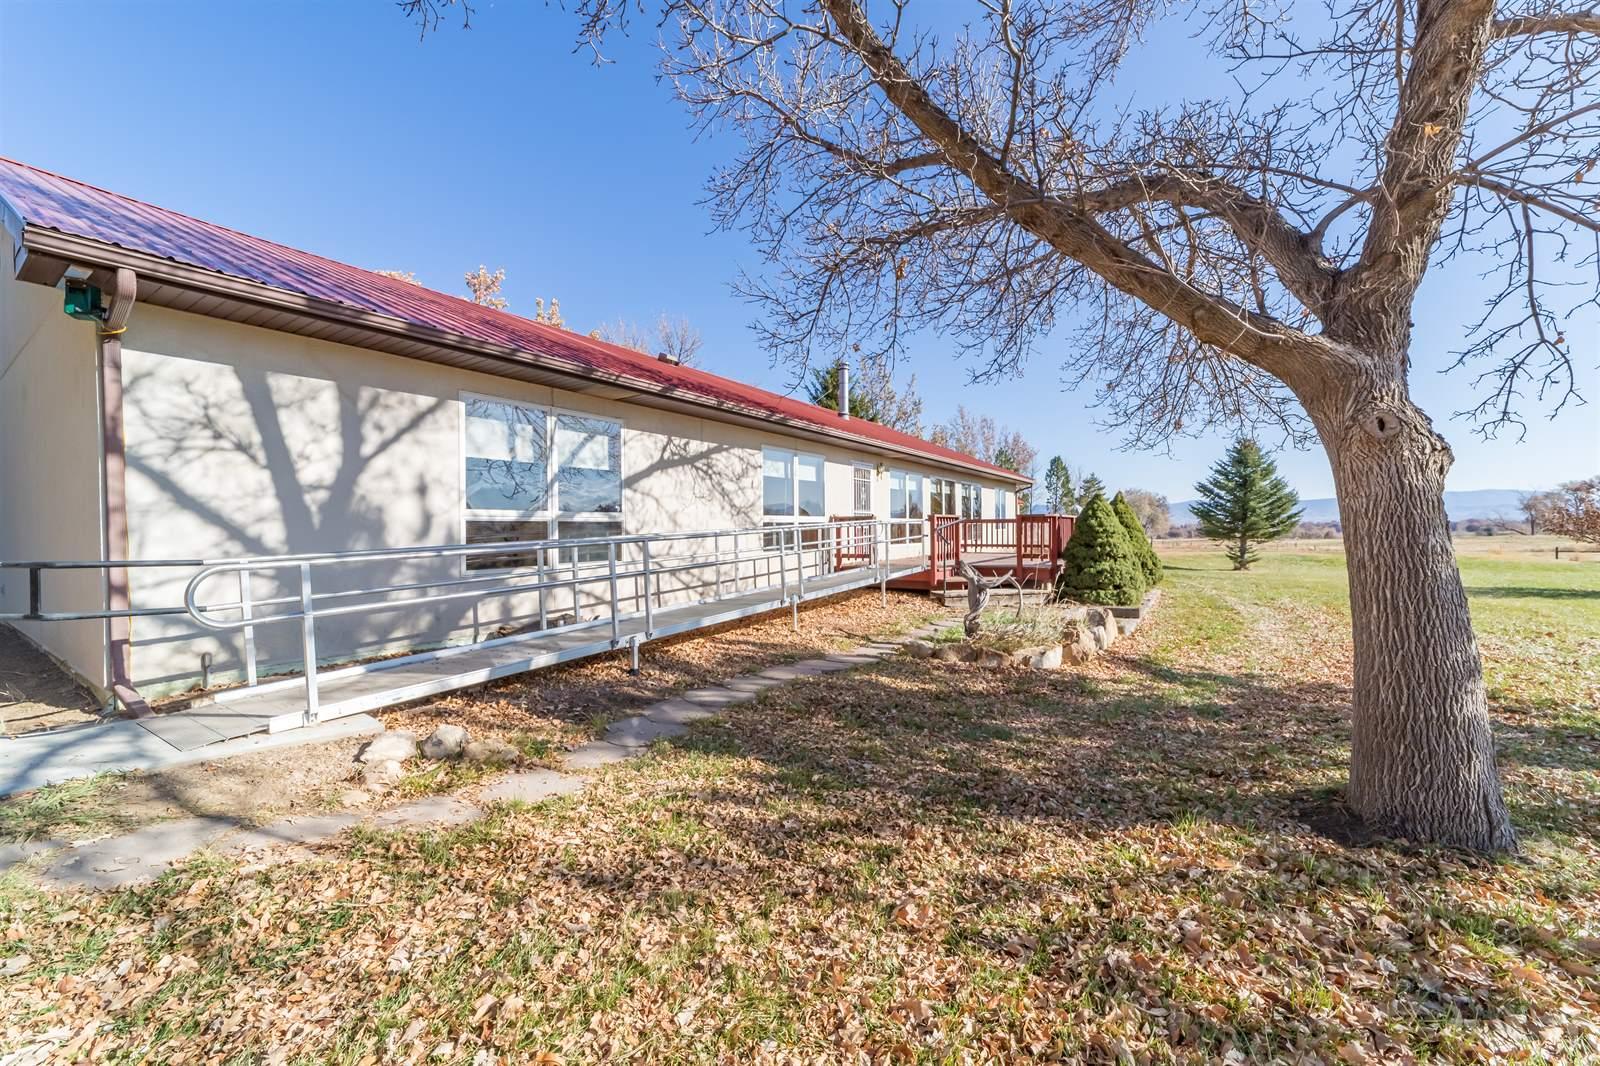 15250 6000 Road, Montrose, CO 81403